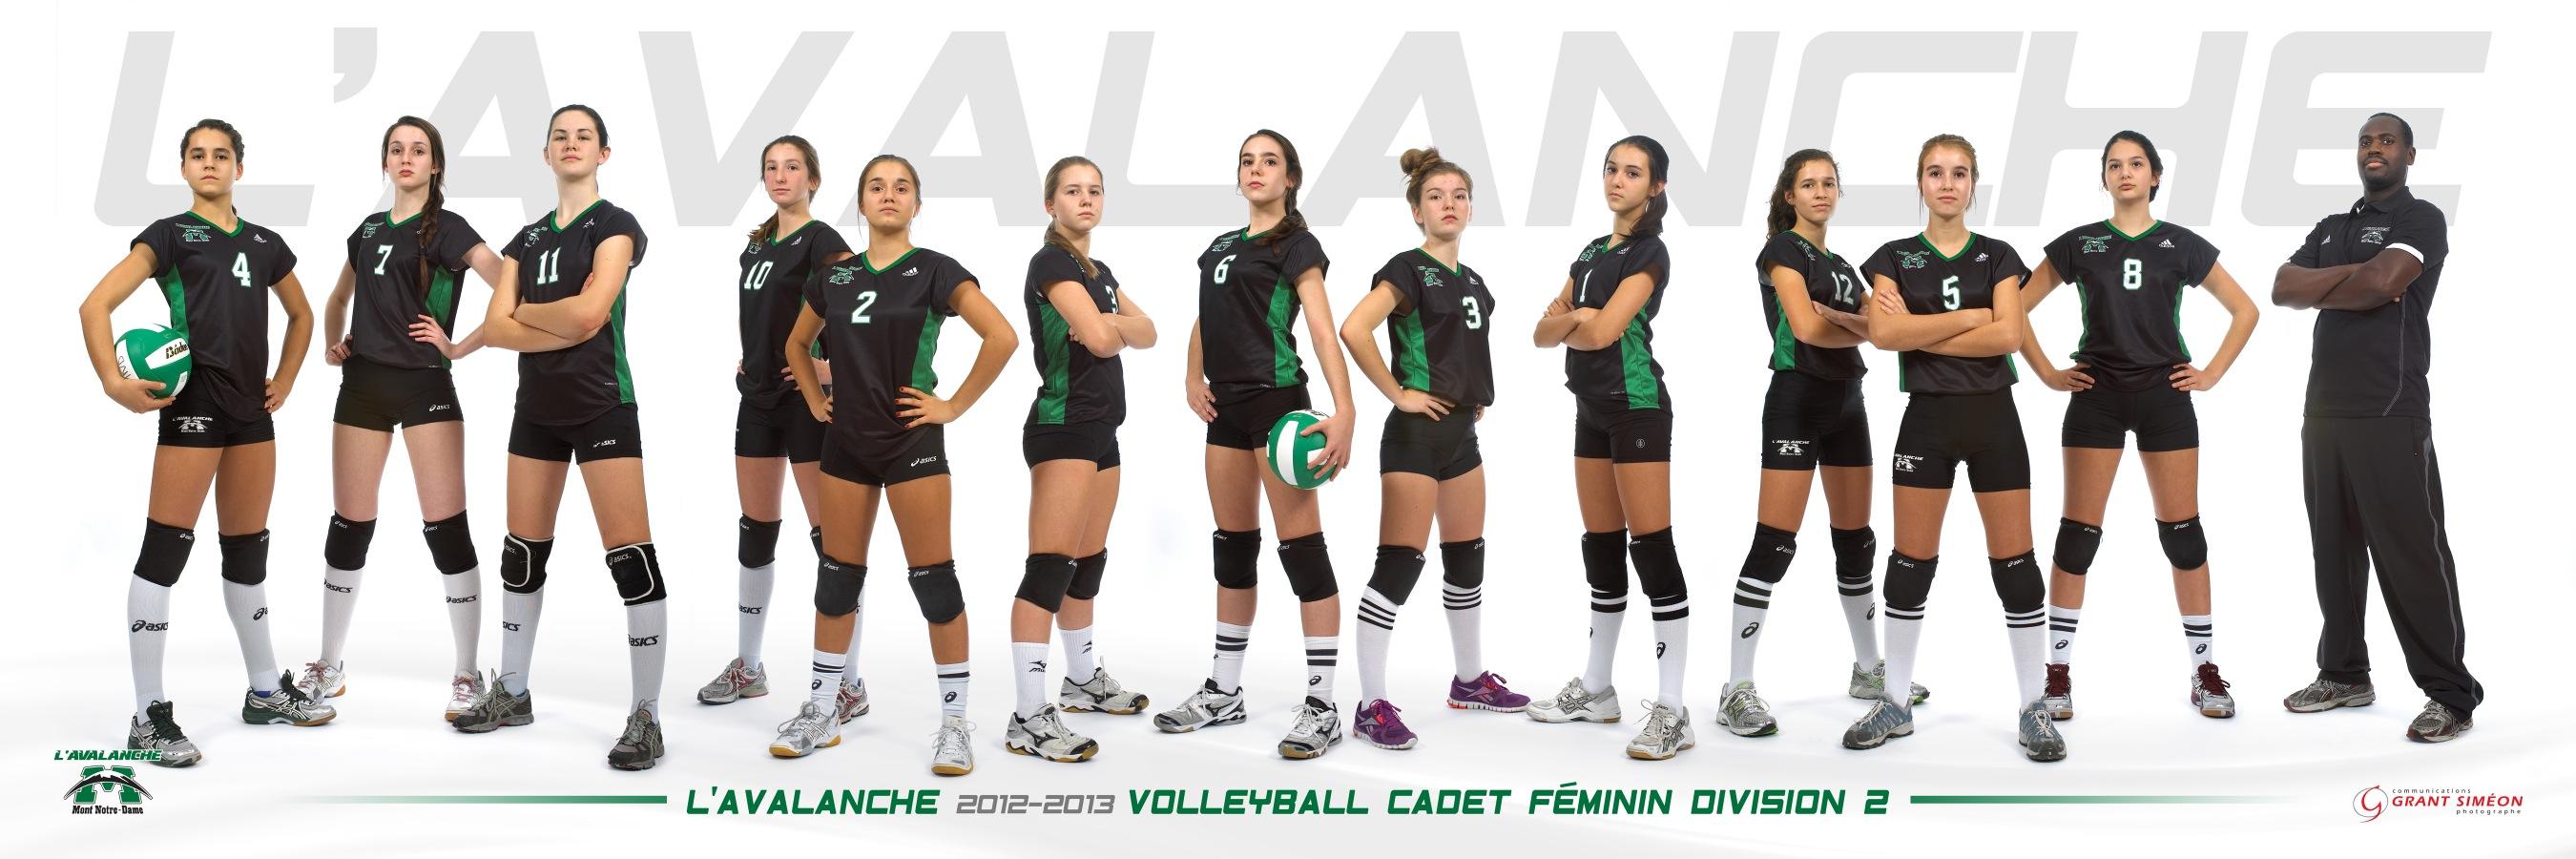 volleyball cadet division 2